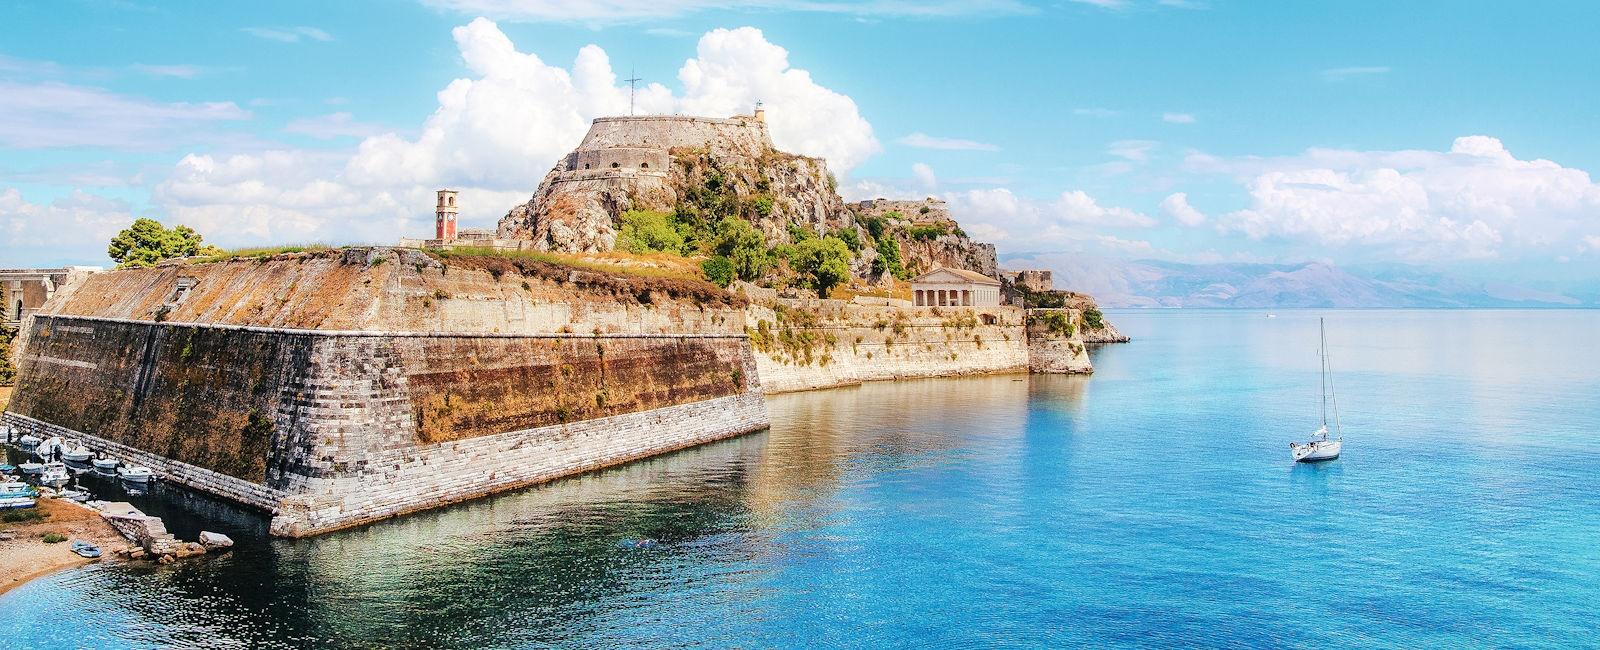 luxury corfu town holidays